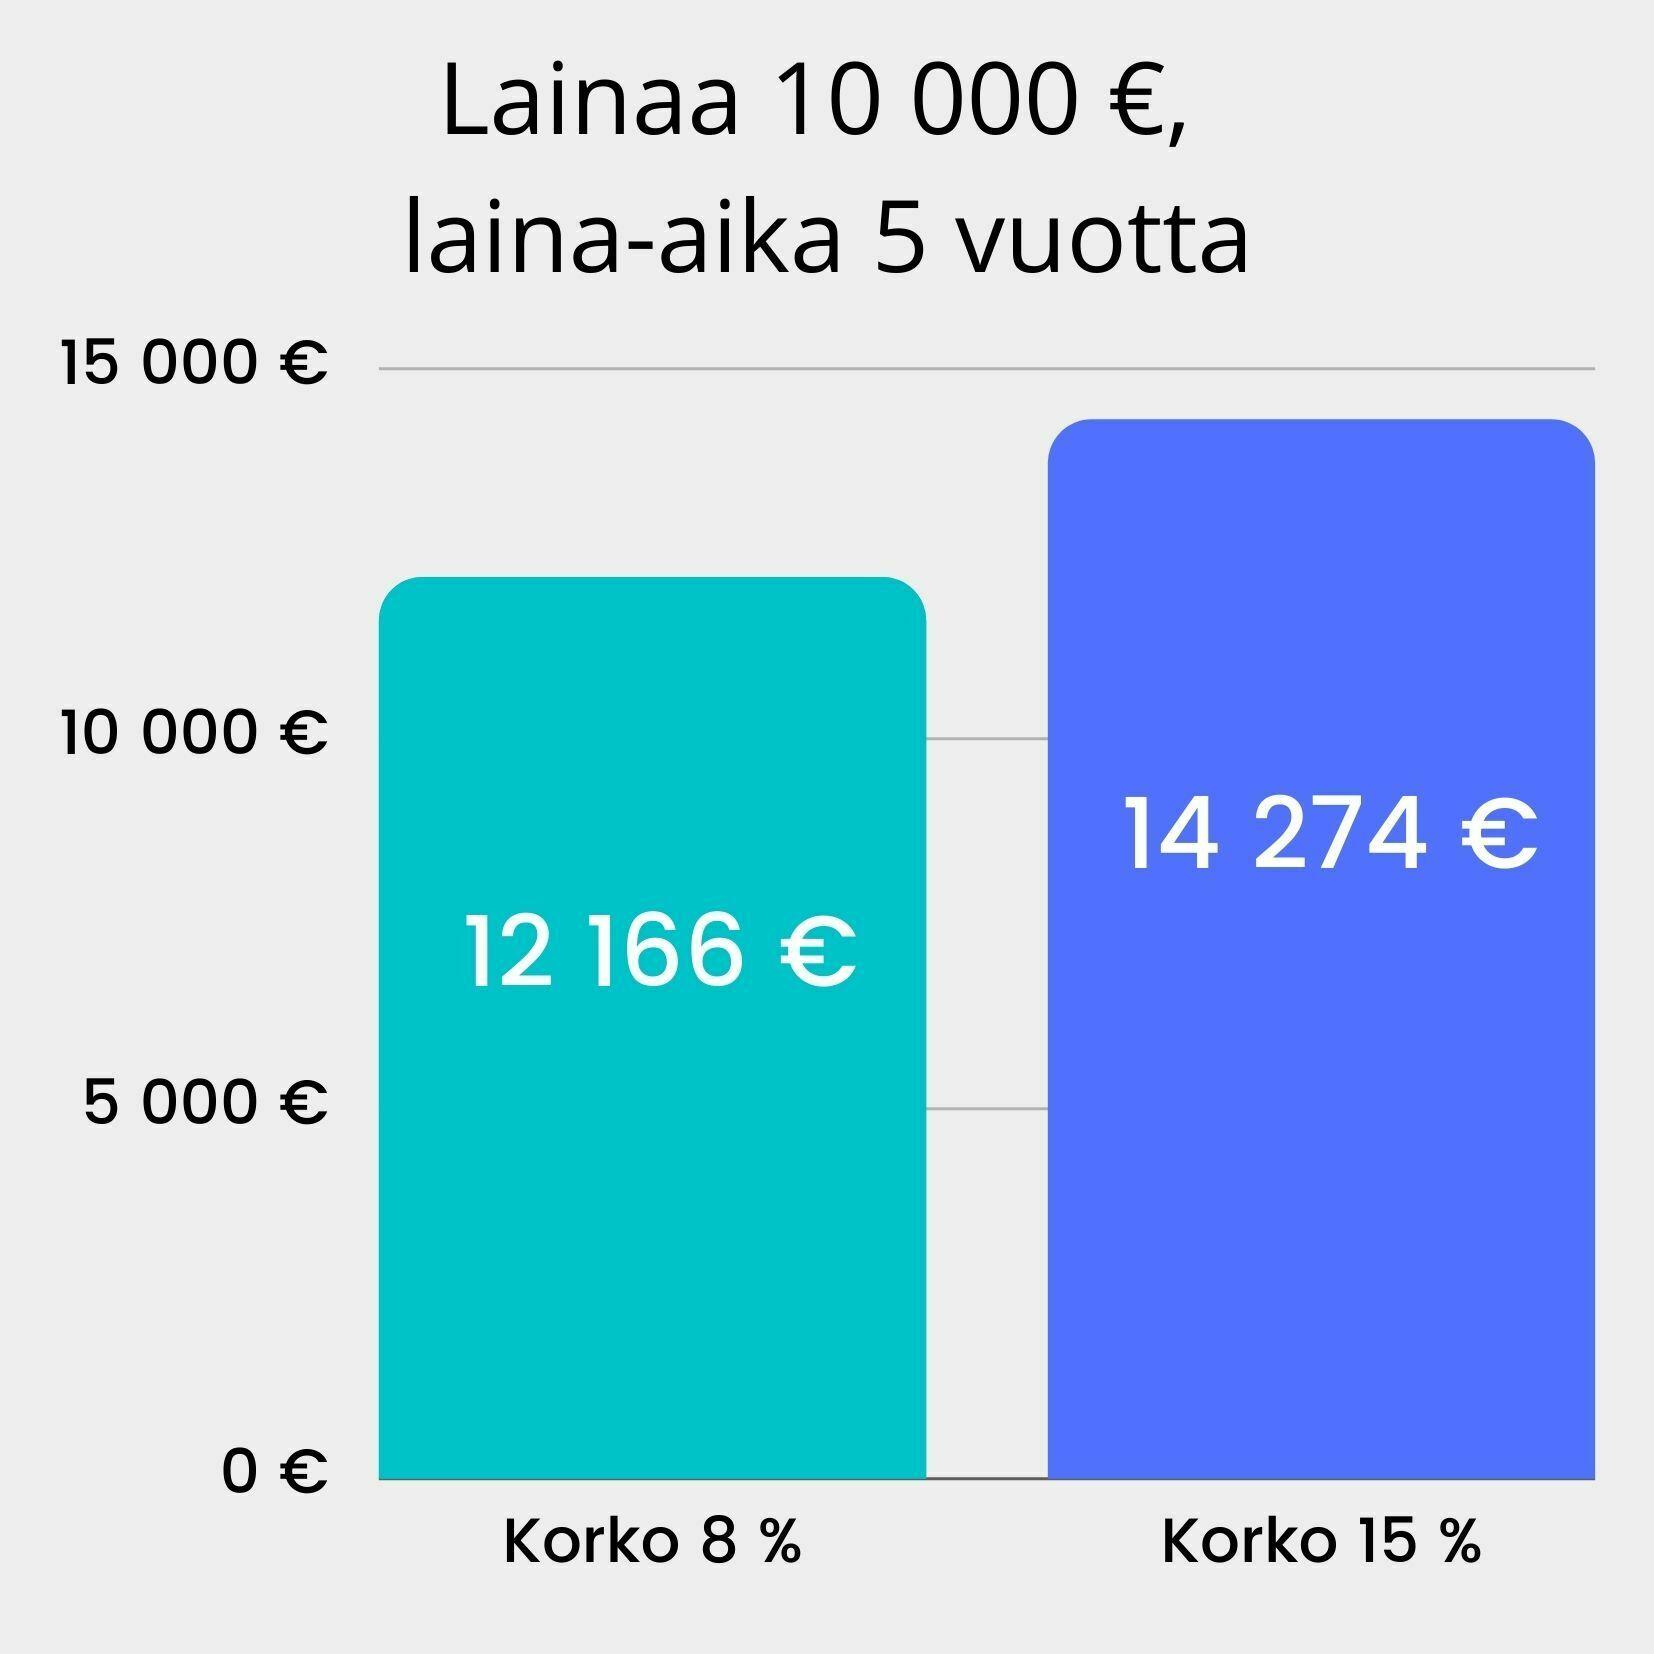 koron vaikutus 10000 euron lainan hintaan, laina-ajan ollessa 5v